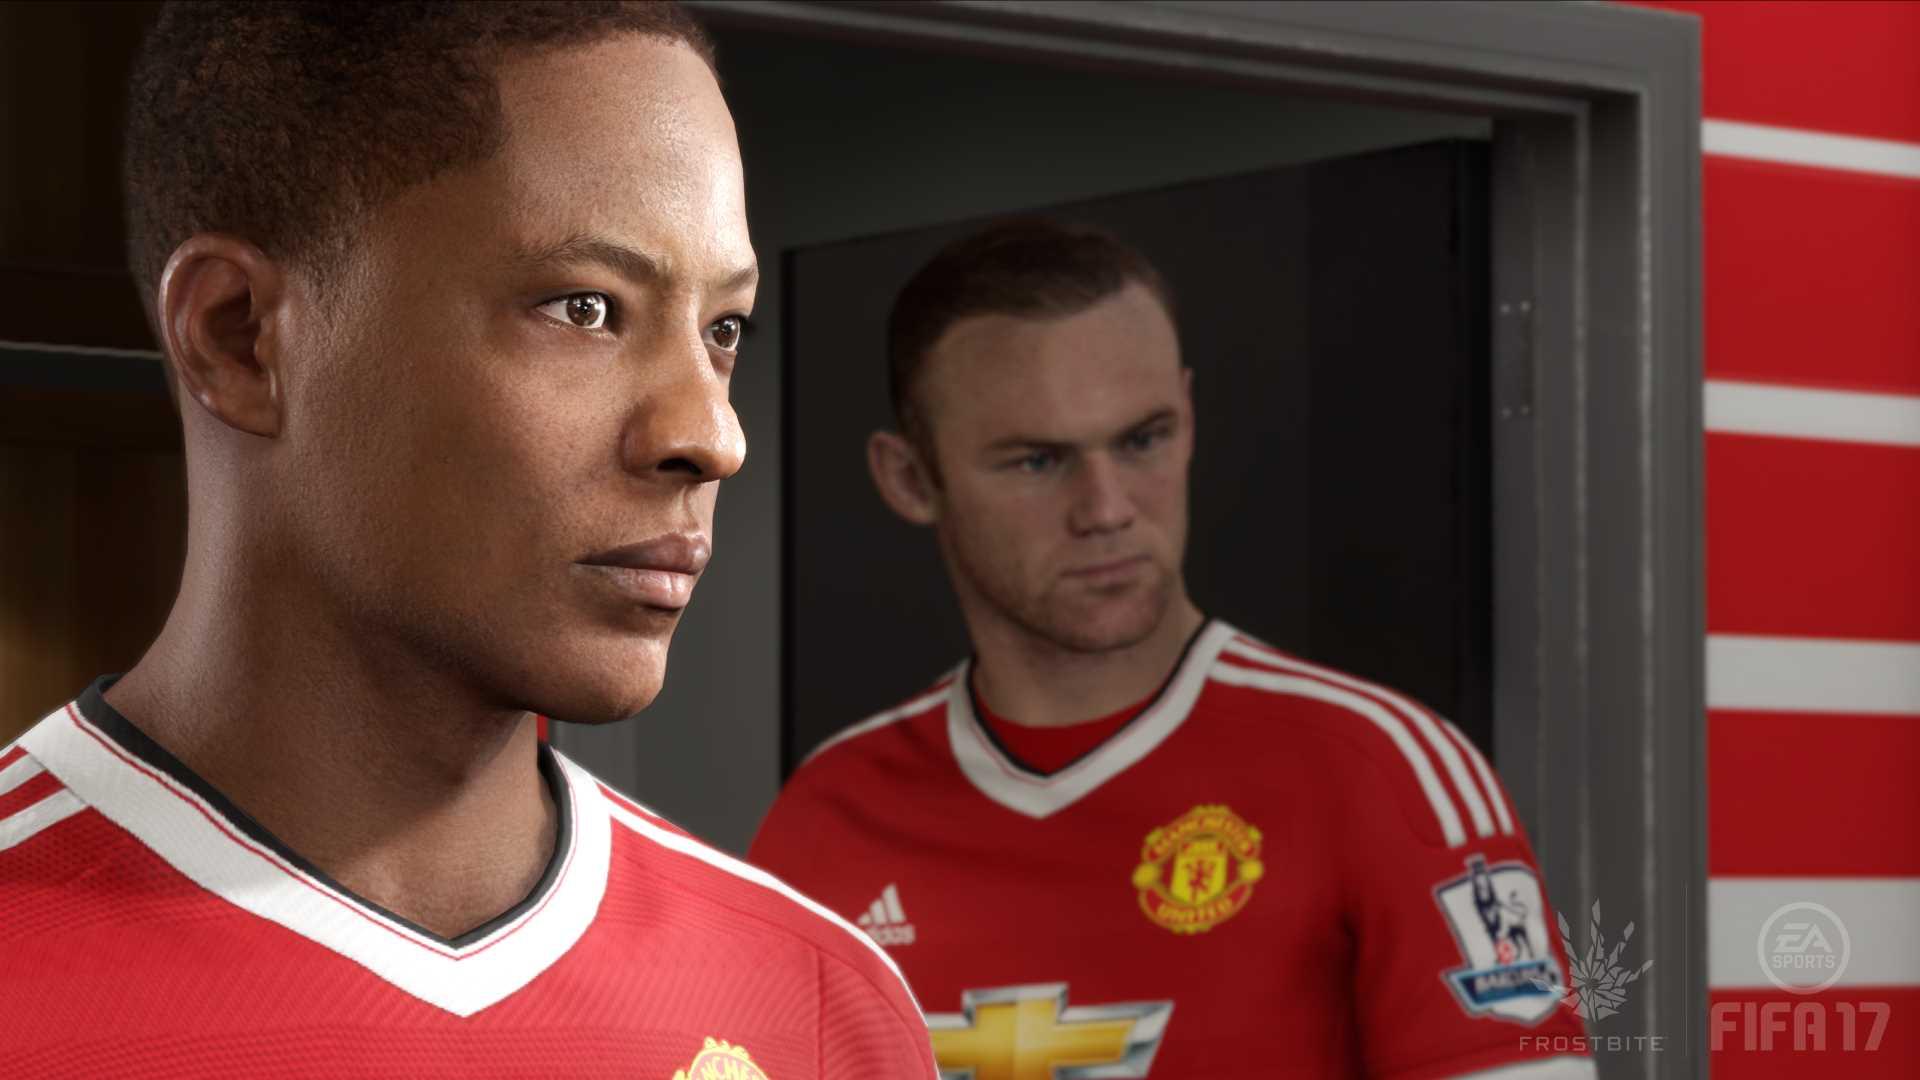 FIFA17_XB1_PS4_JOURNEY_HUNTER_ROONEY_WM